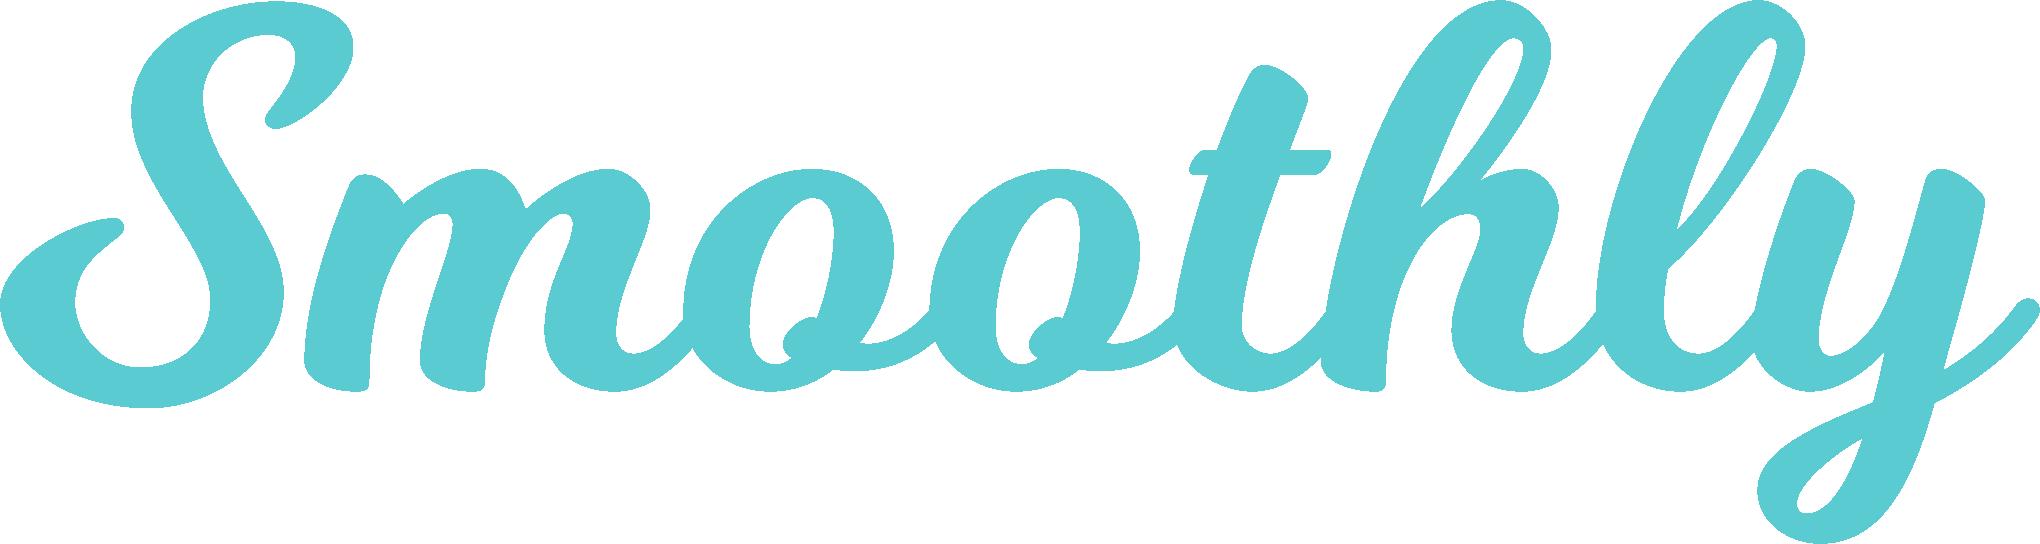 Smoothly Oy logo